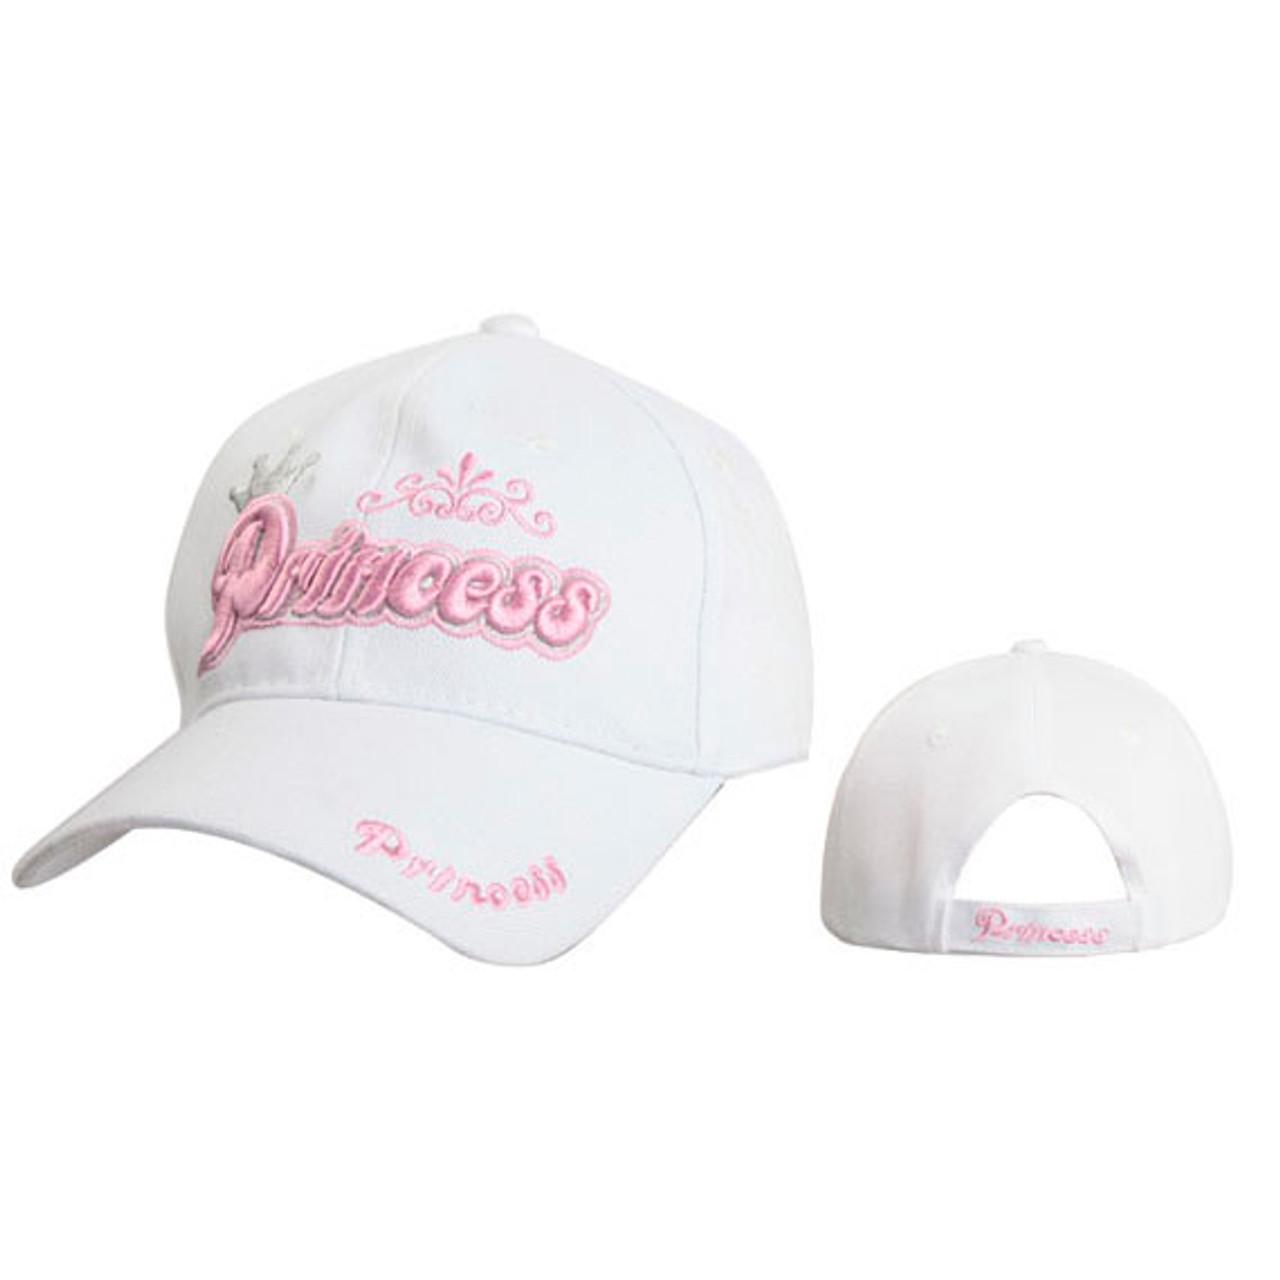 Wholesale Princess Cap for Women White